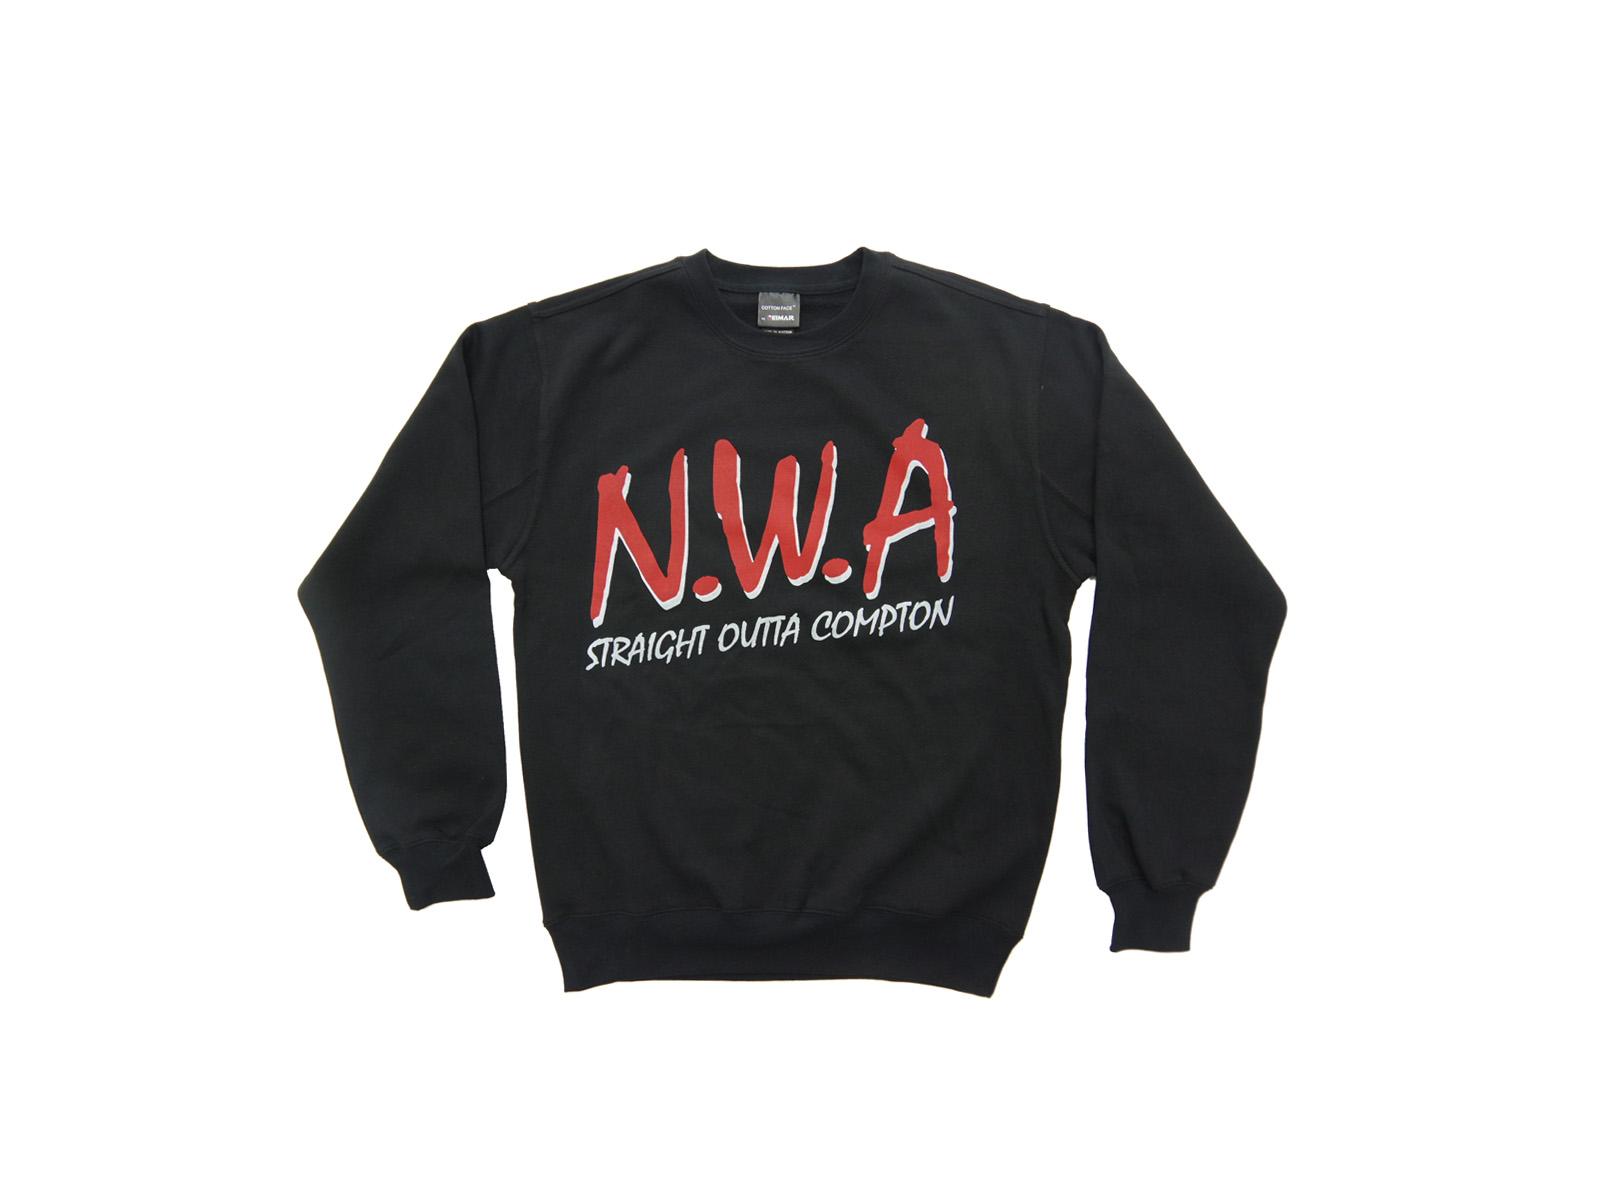 N.W.A. Classic Logo Sweater